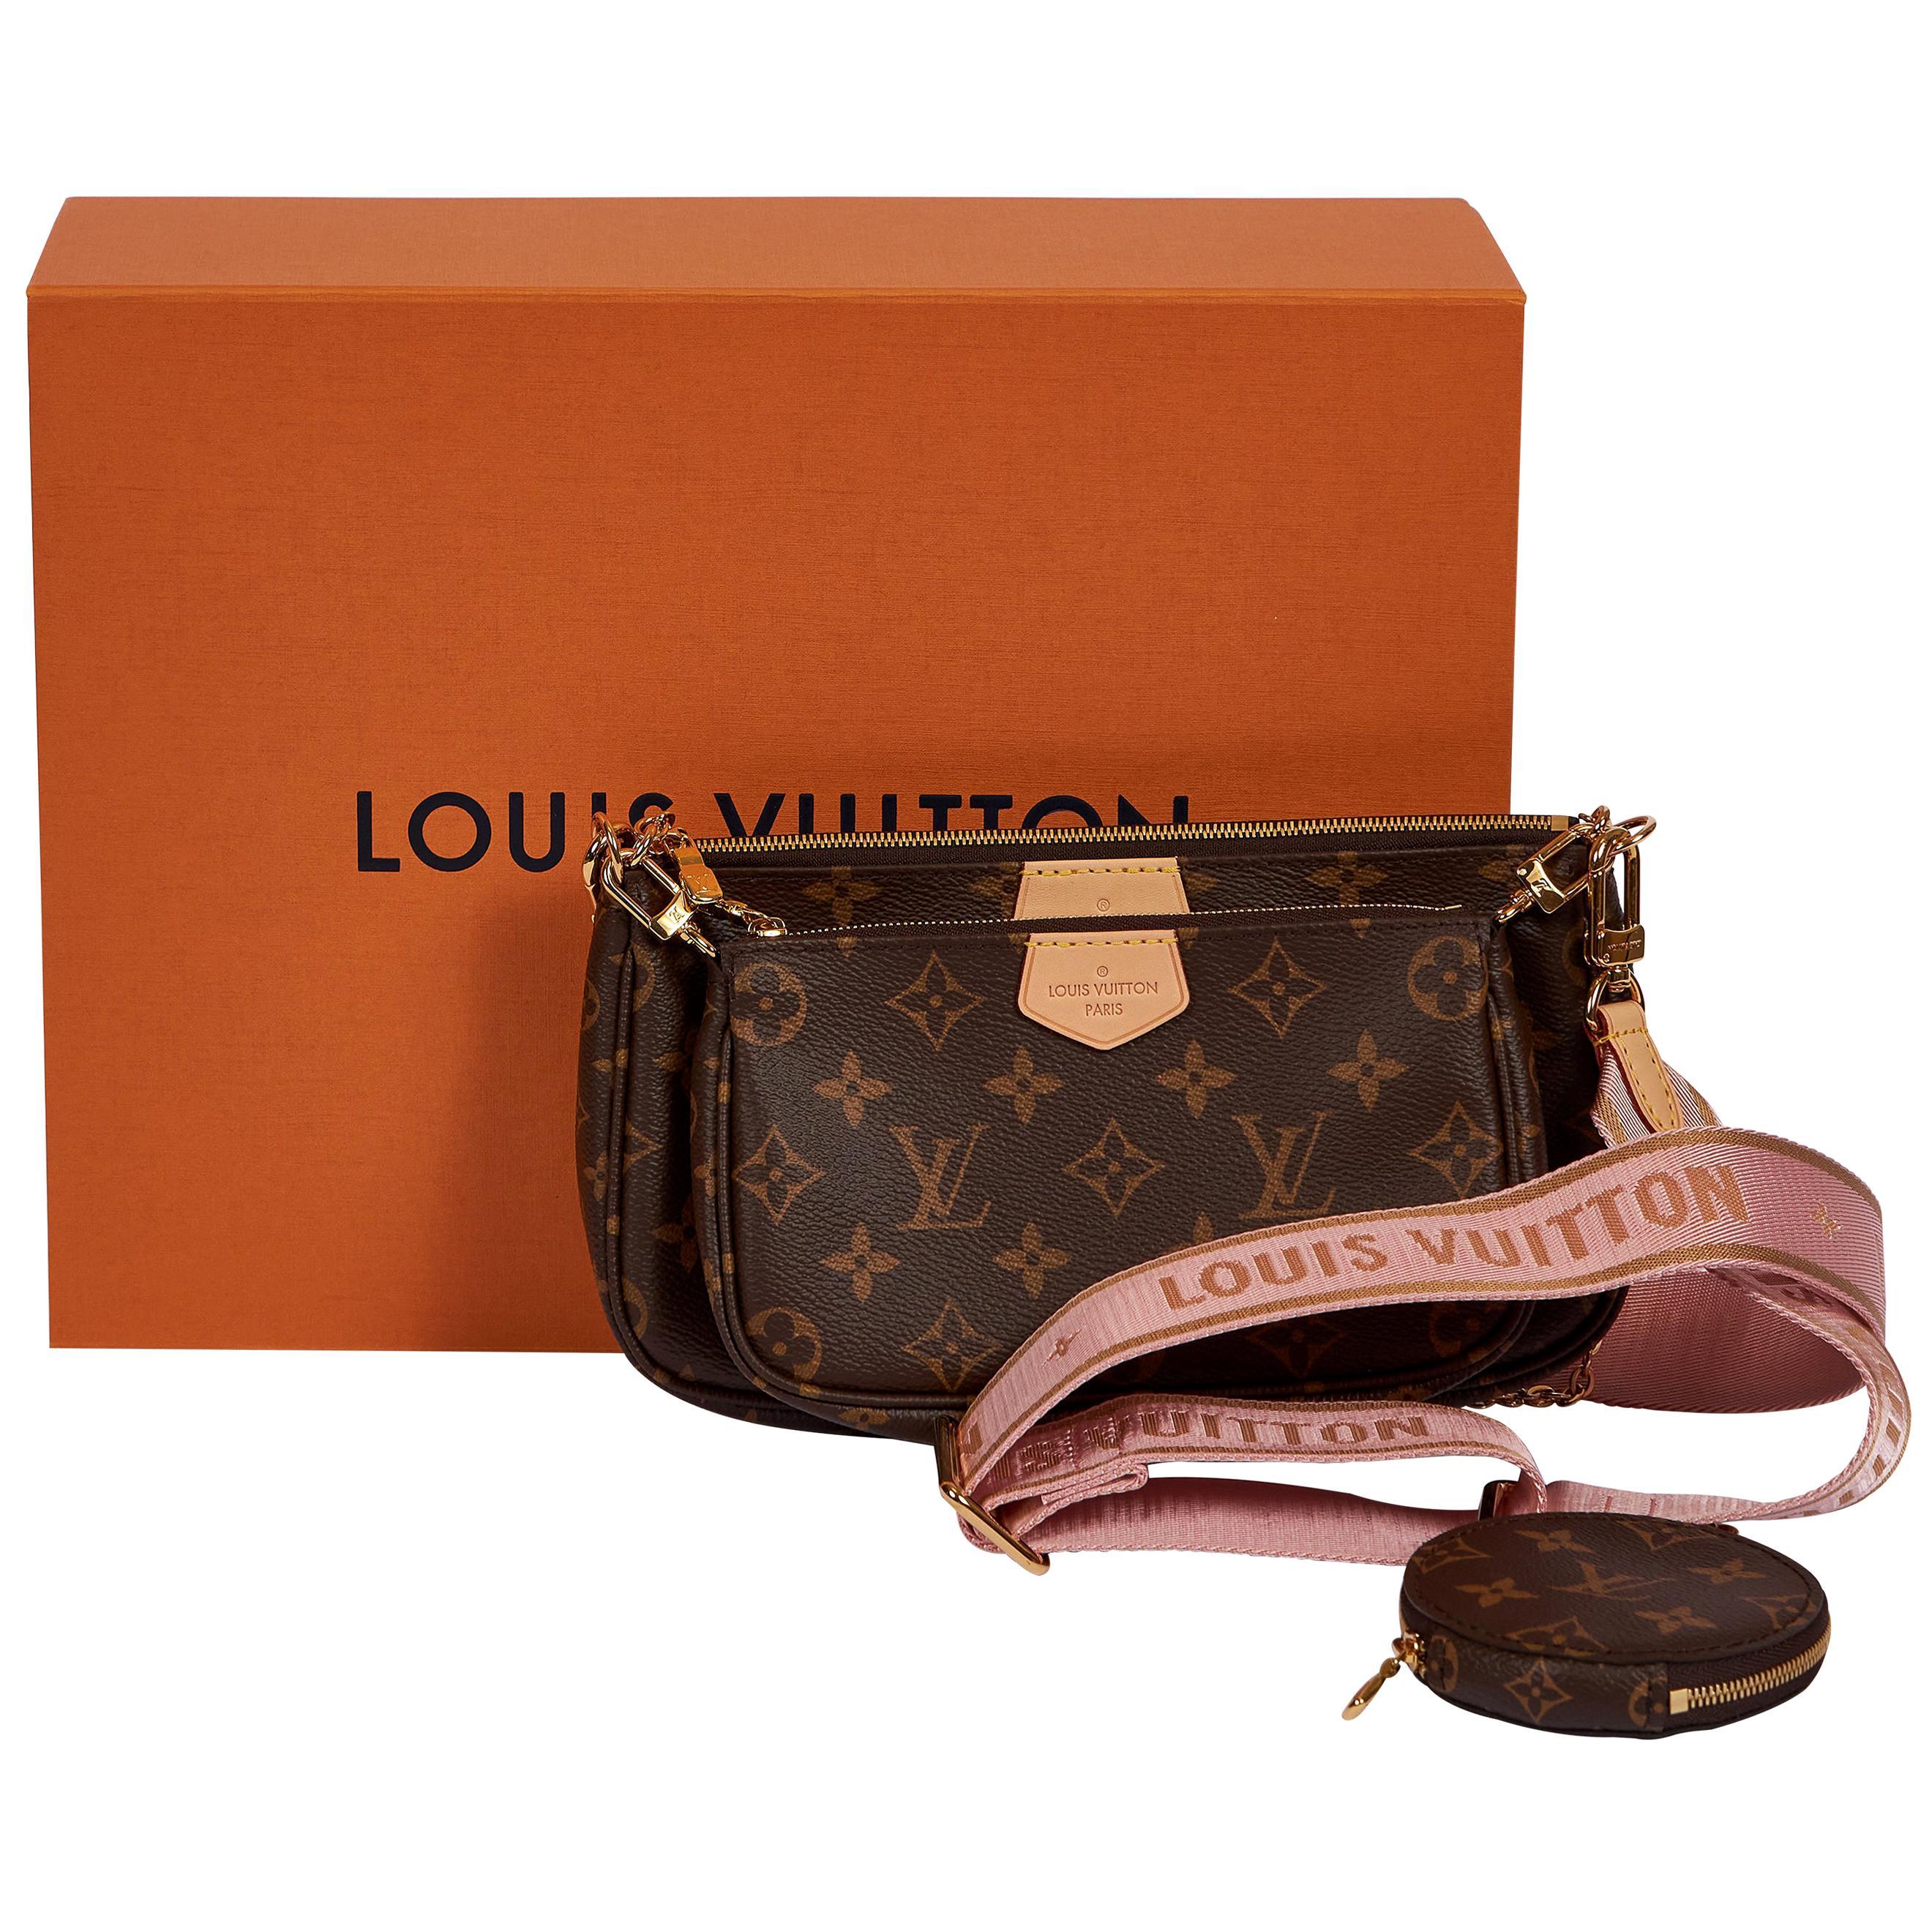 New in Box Louis Vuitton Multi Pink Pouchette Bag